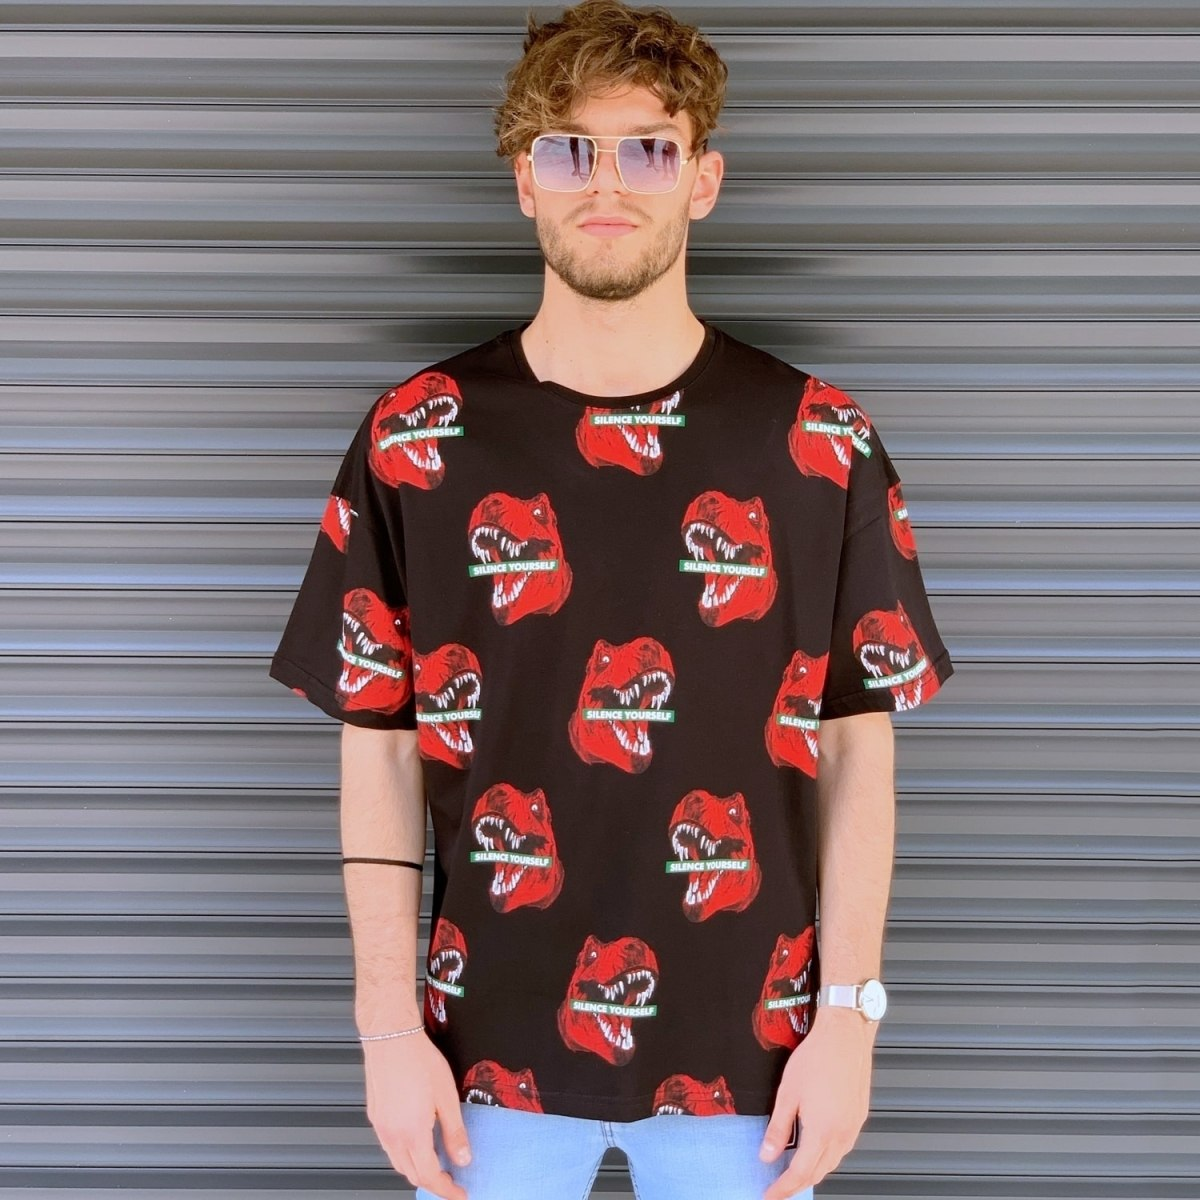 Men's Jurrasic Dinosaur Pattern T-Shirt Brown Mv Premium Brand - 1